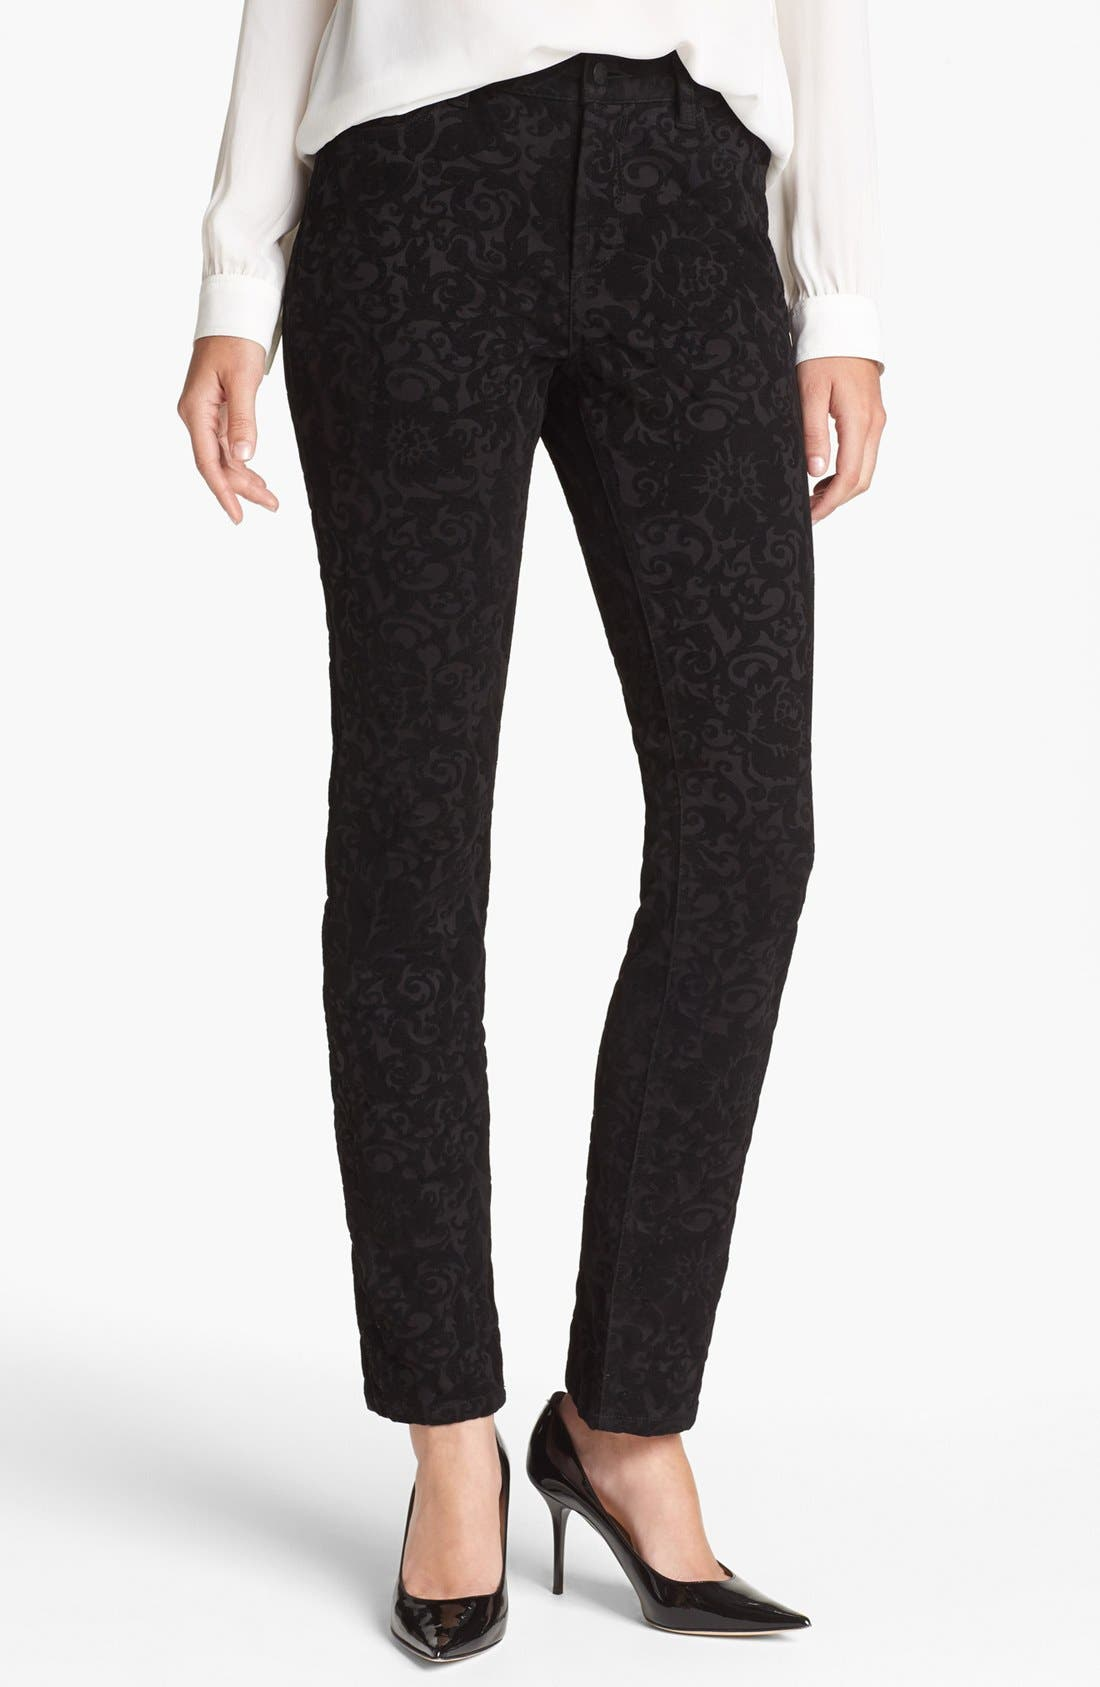 Main Image - NYDJ 'Sheri' Flocked Stretch Skinny Jeans